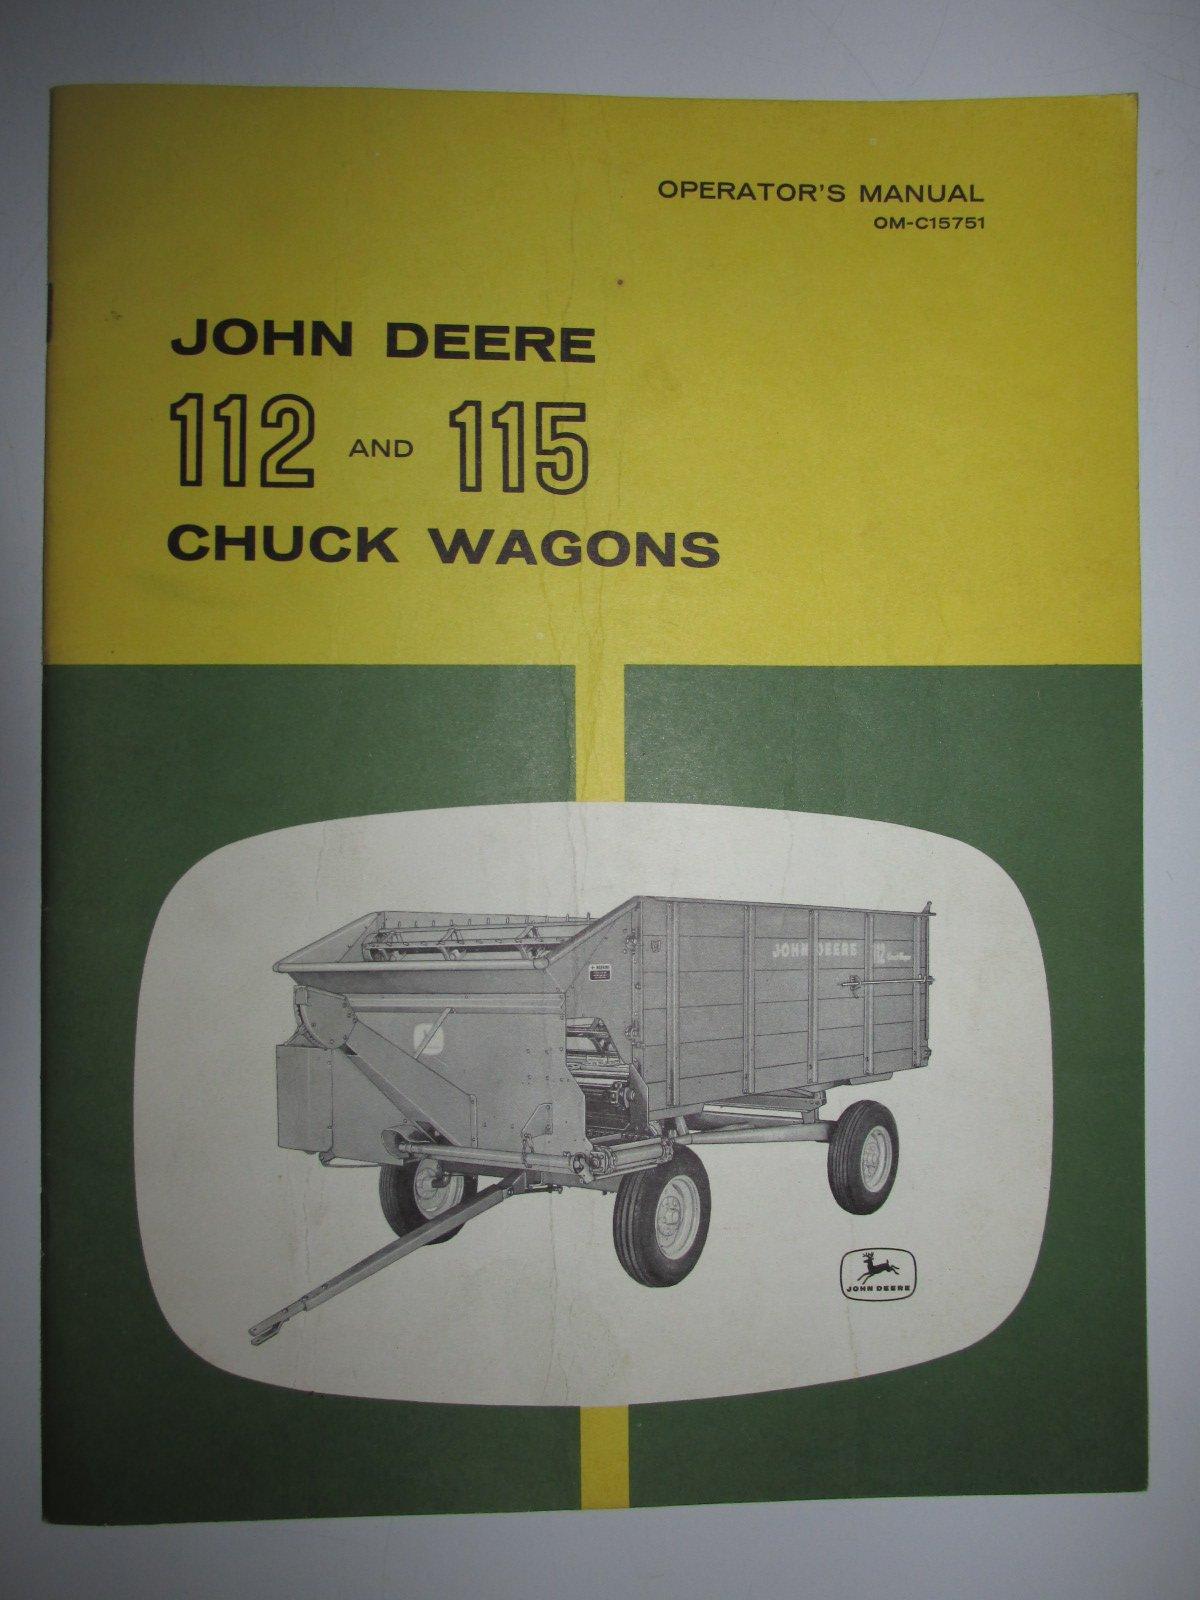 John Deere 112 115 Chuck Wagon Operators Manual Original OM-C15751: John  Deere: Amazon.com: Books